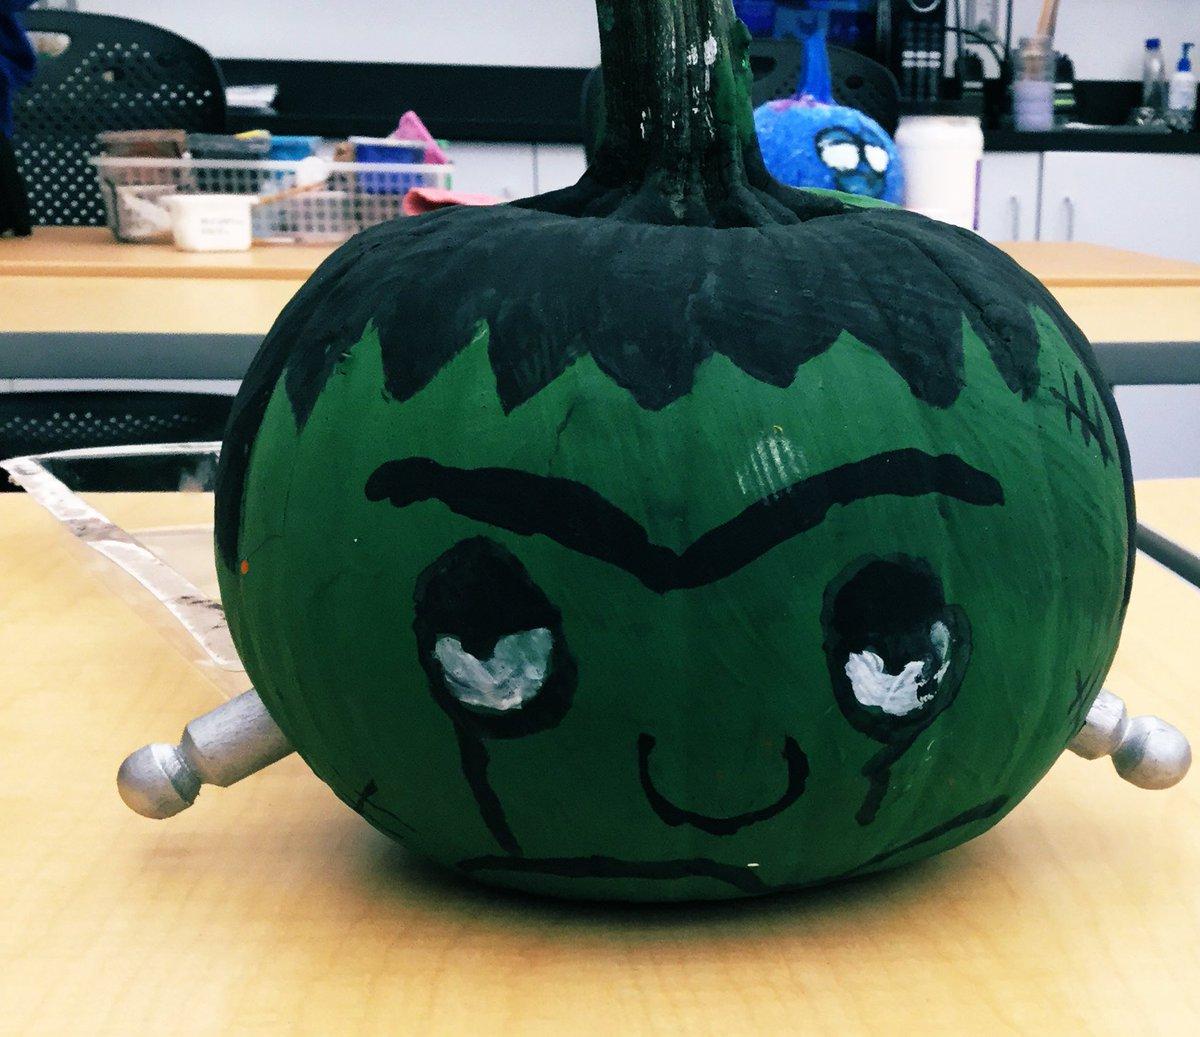 Painted pumpkin & Guess how many seeds challenge <a target='_blank' href='https://t.co/waQTDxSfq8'>https://t.co/waQTDxSfq8</a>